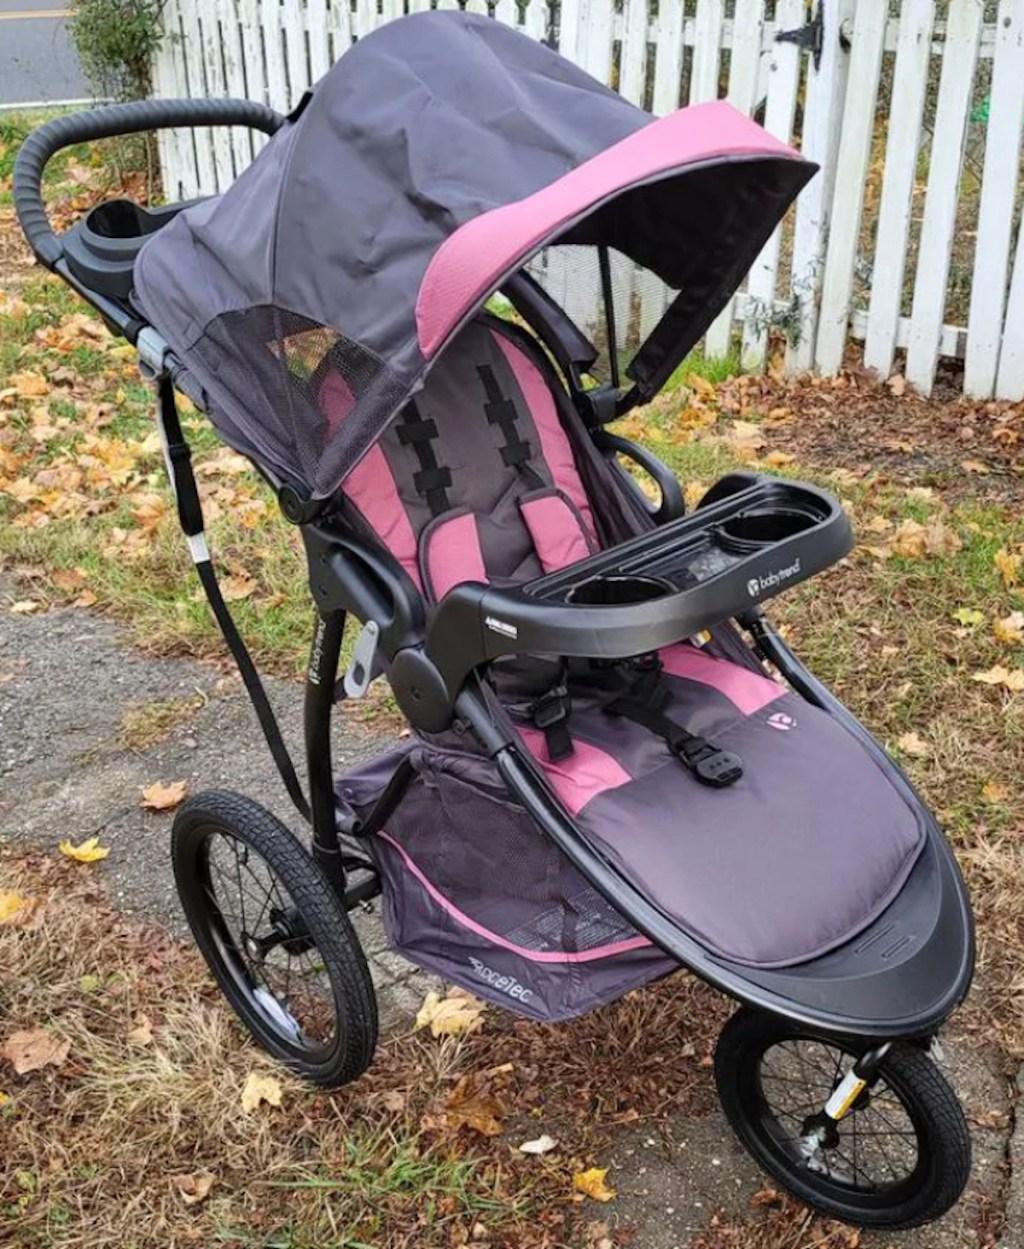 pink and gray jogging stroller outside on sidewalk